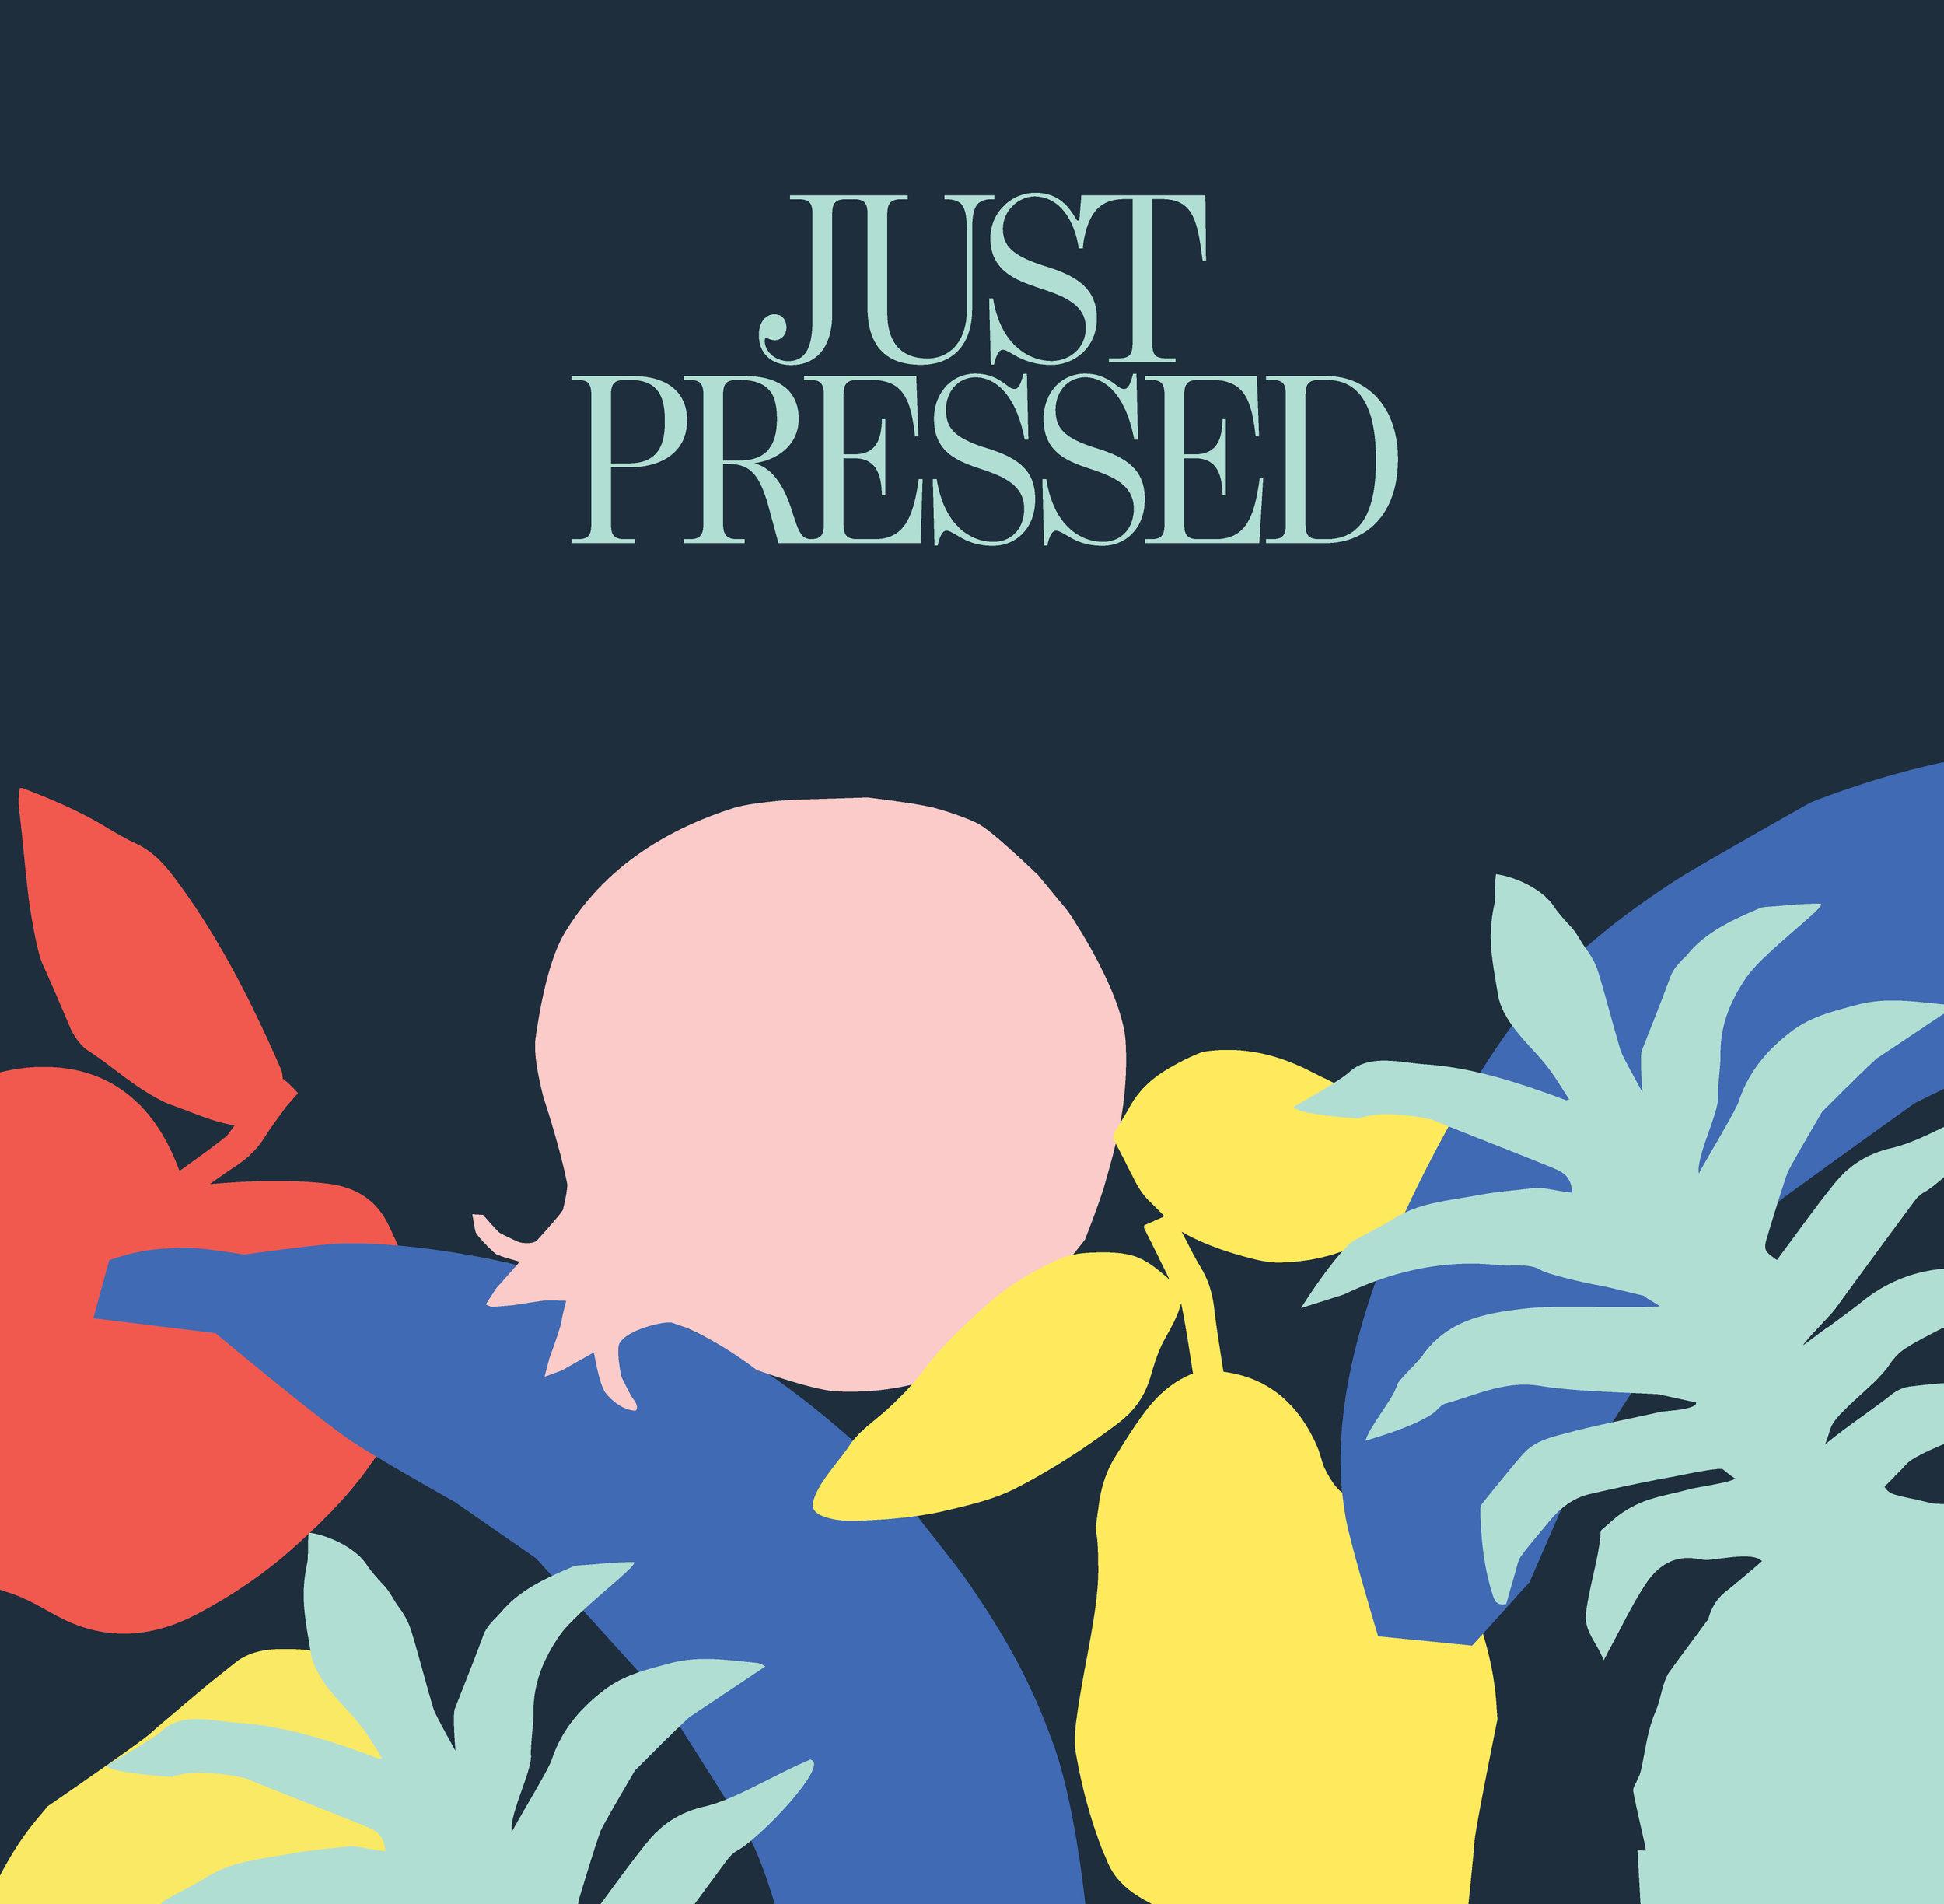 JUST-PRESSED-Behance.jpg